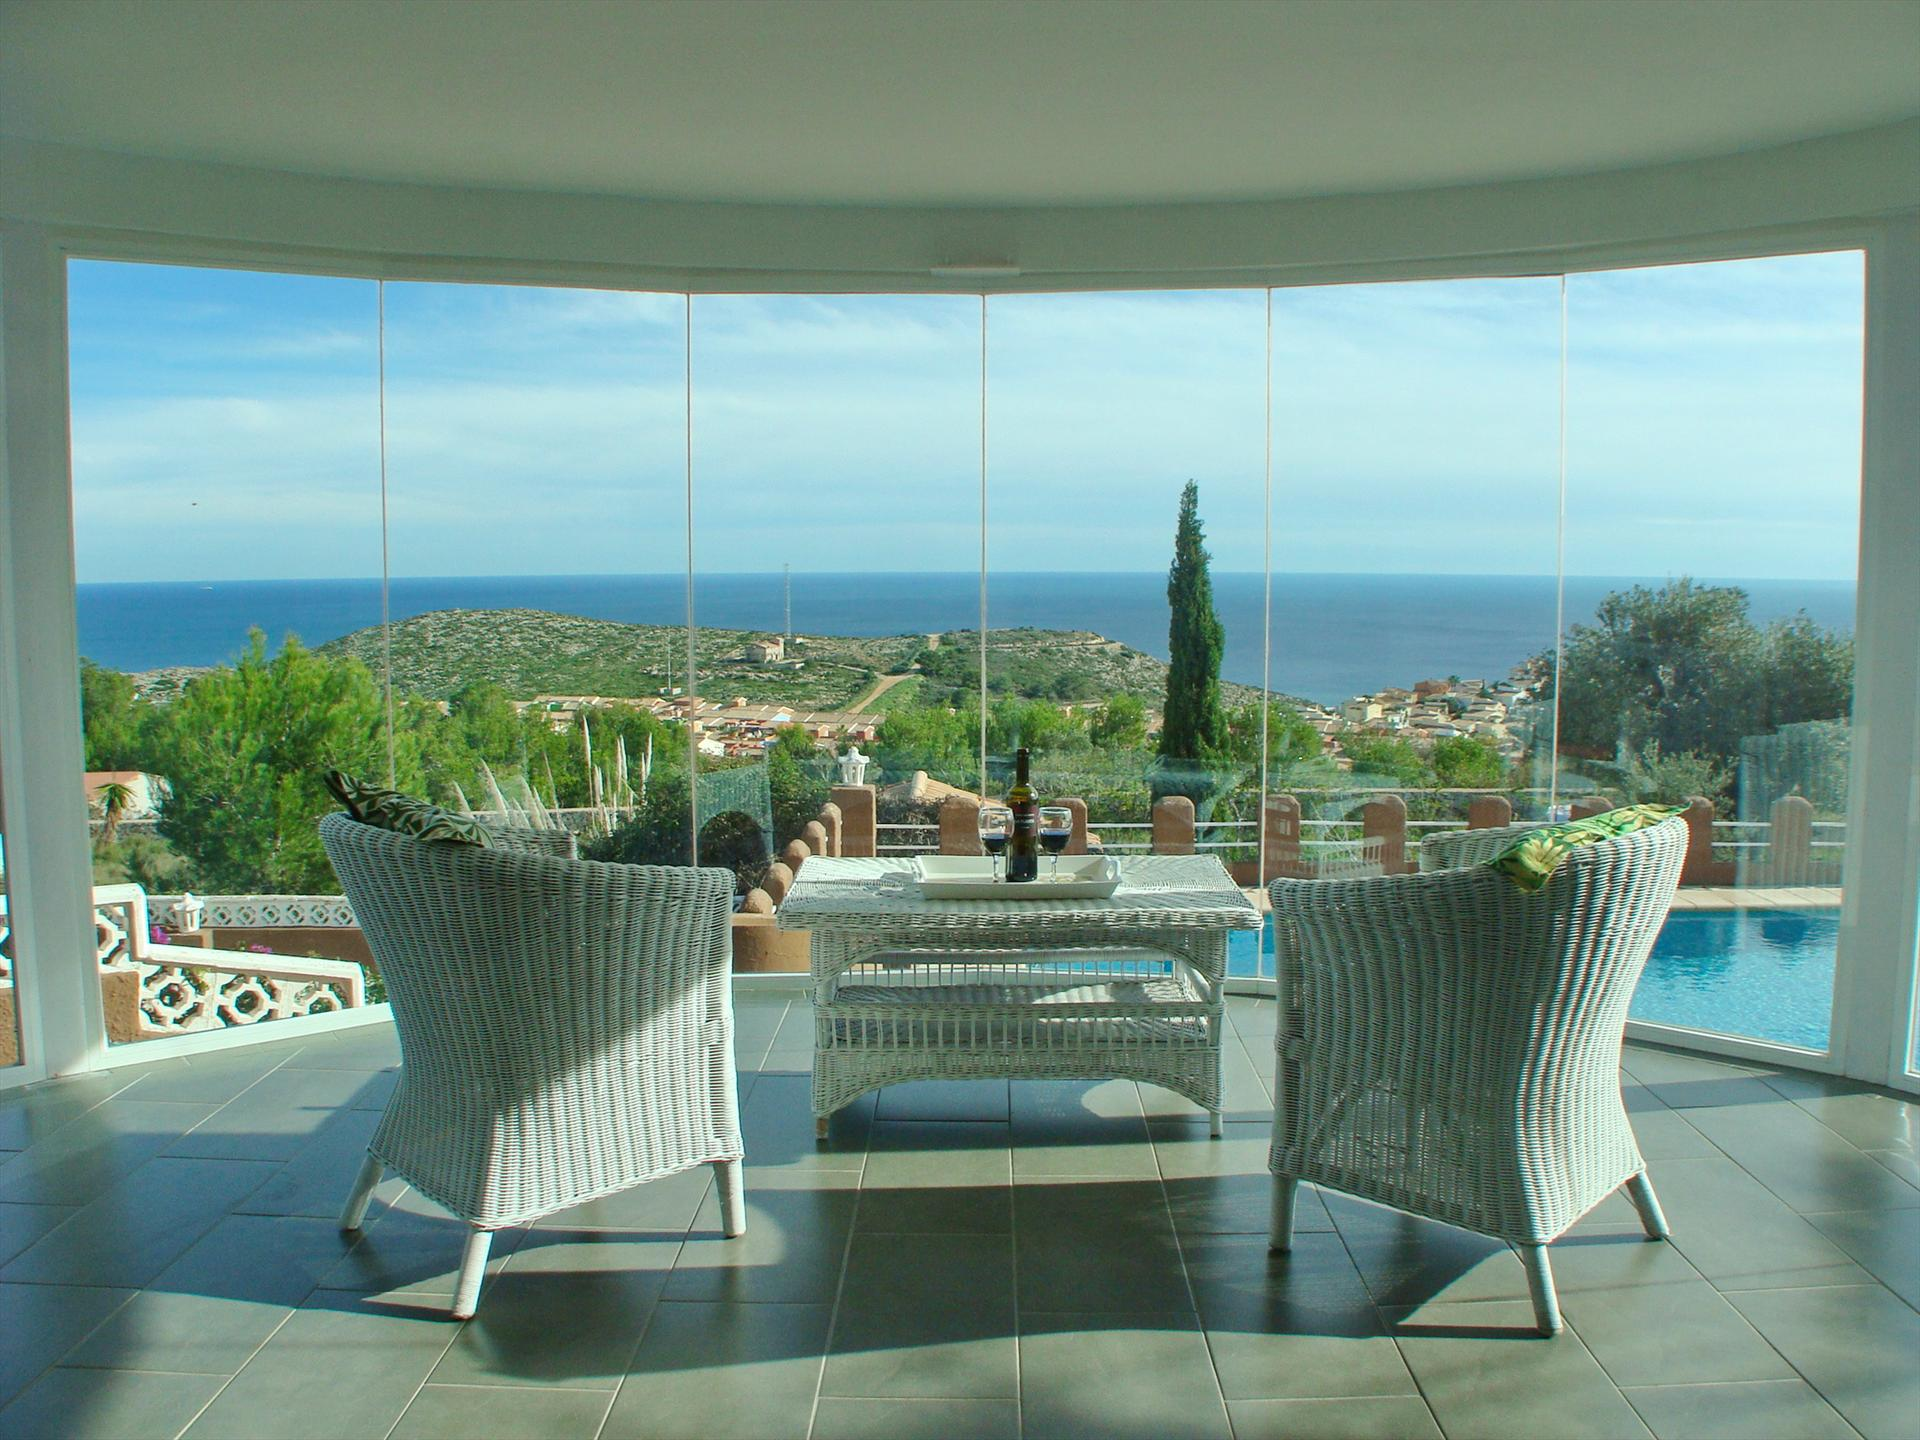 Villa Carisma Cumbre del Sol,Beautiful and comfortable villa  with private pool in Benitachell, on the Costa Blanca, Spain for 6 persons.....